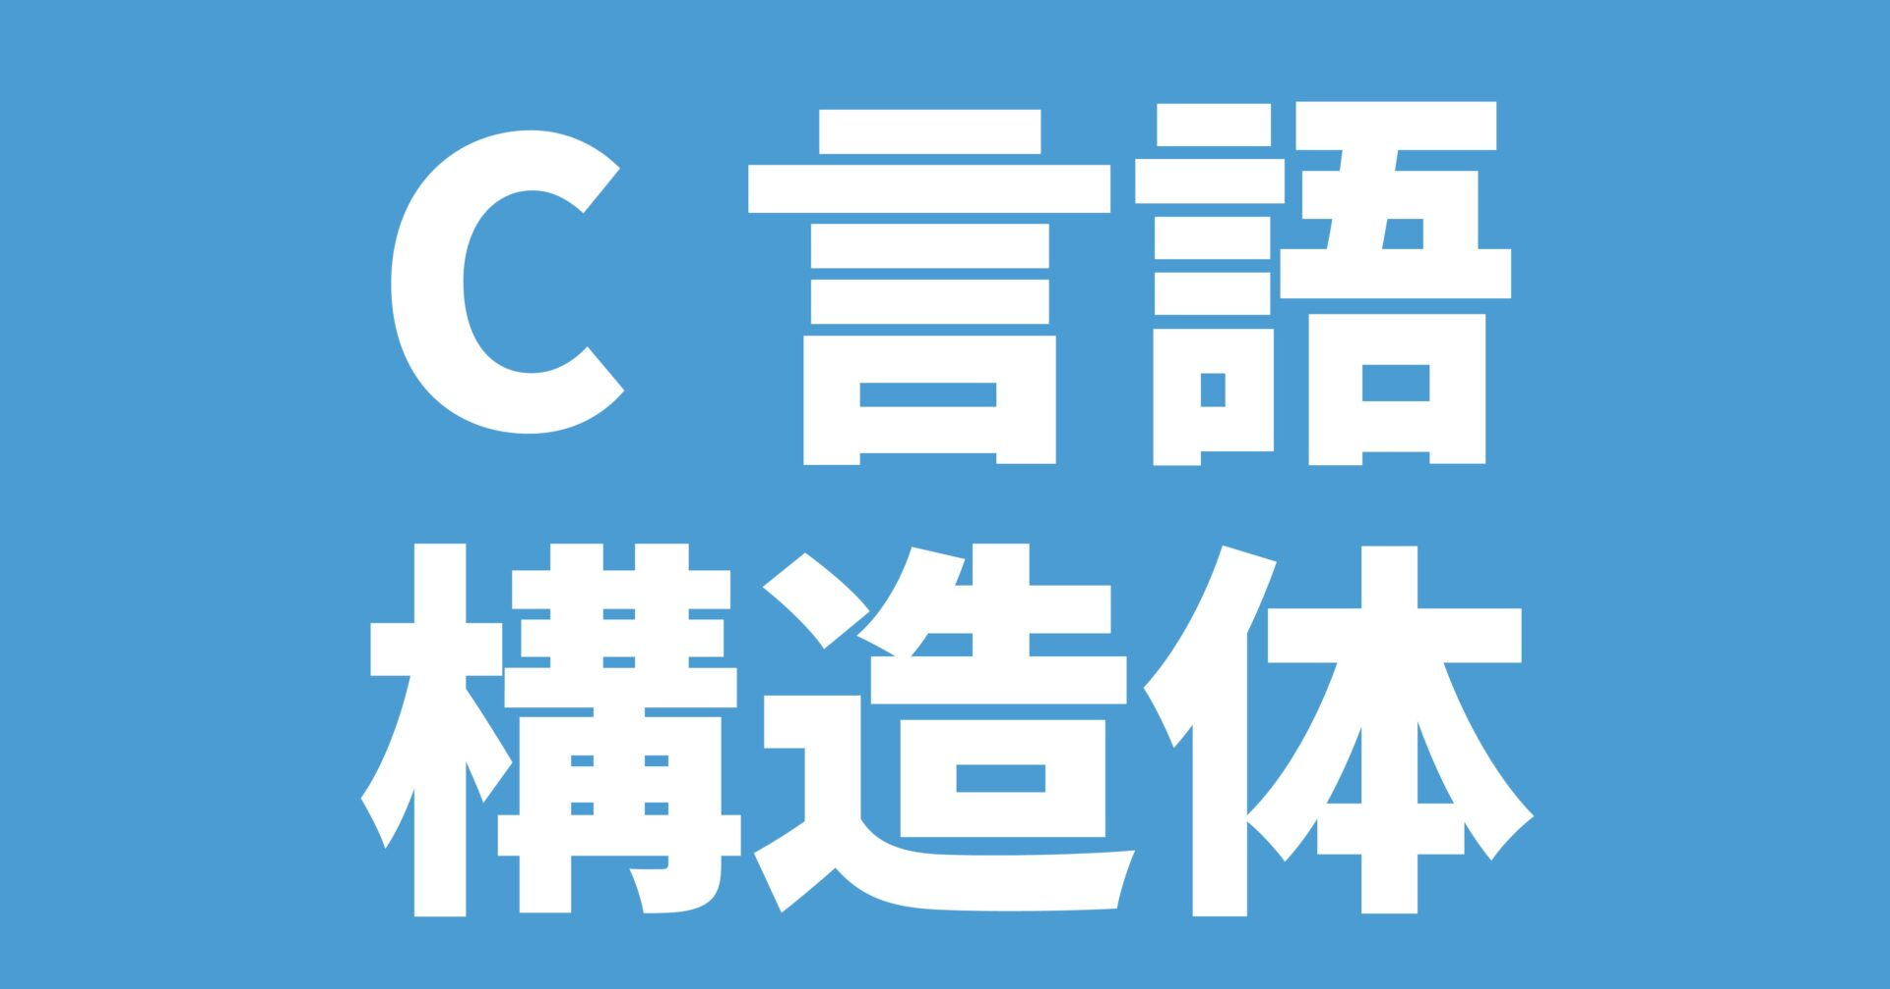 C言語 構造体